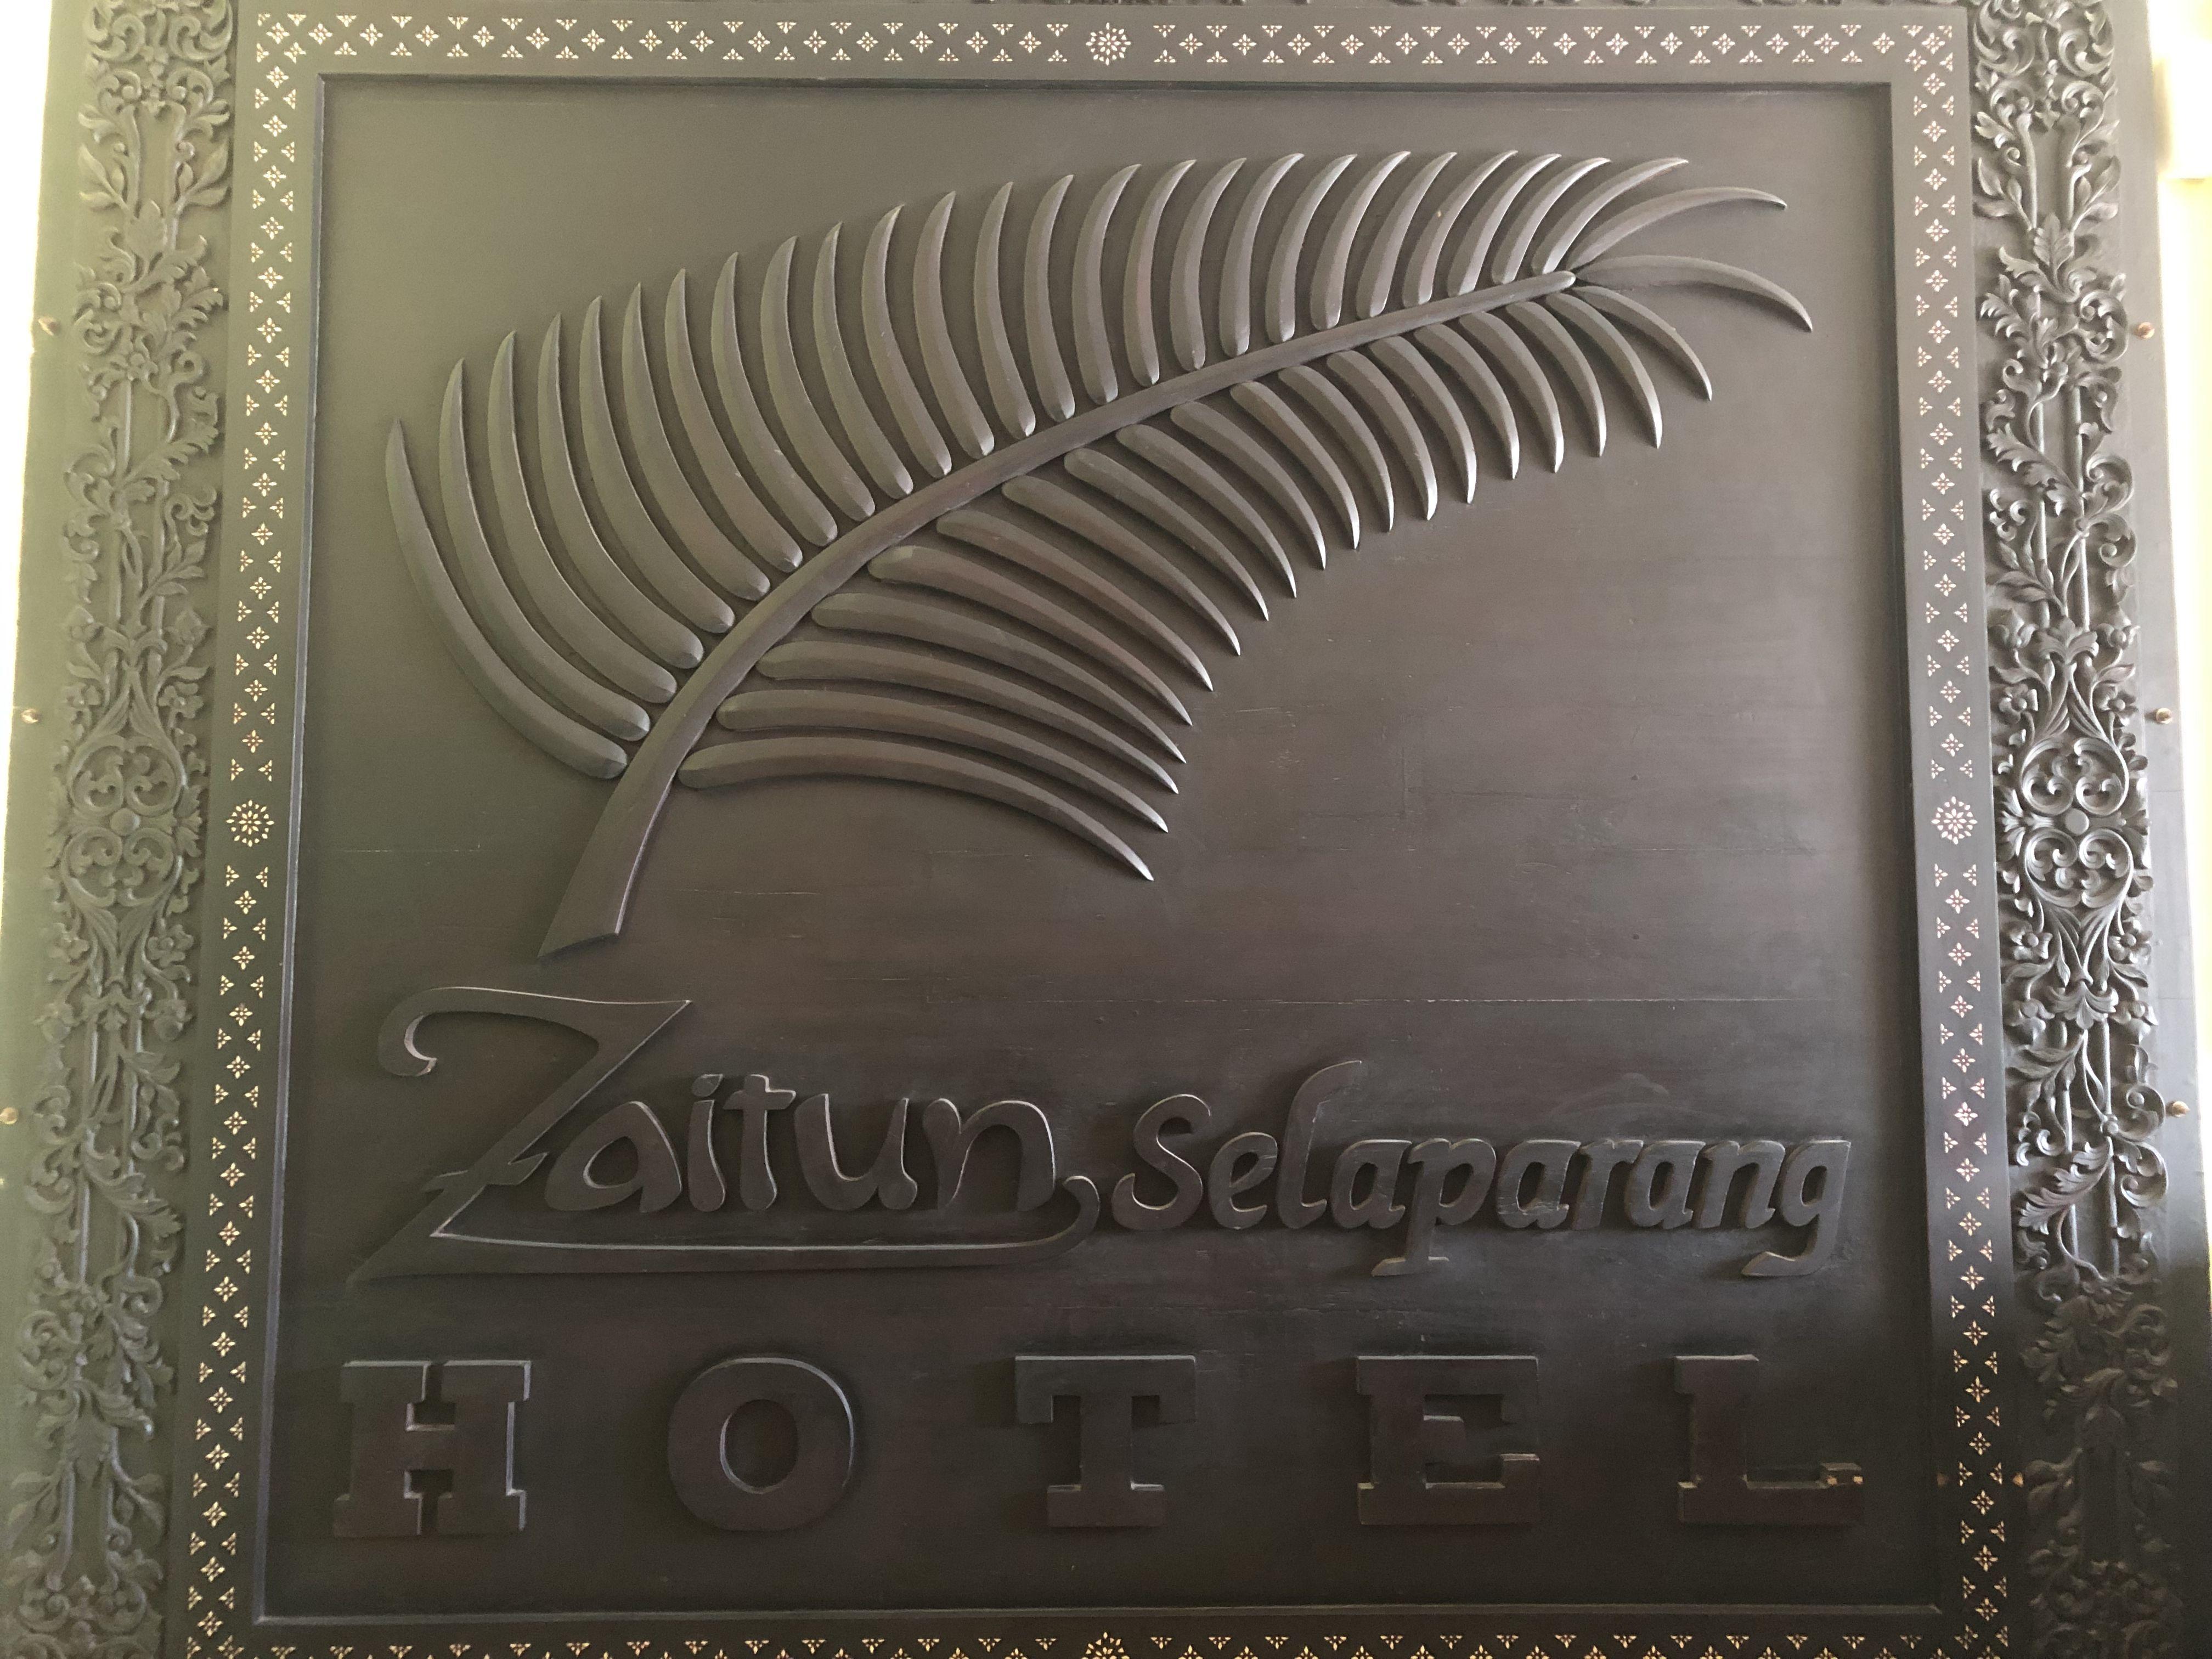 Hotel Zaitun Salaparang, Mataram